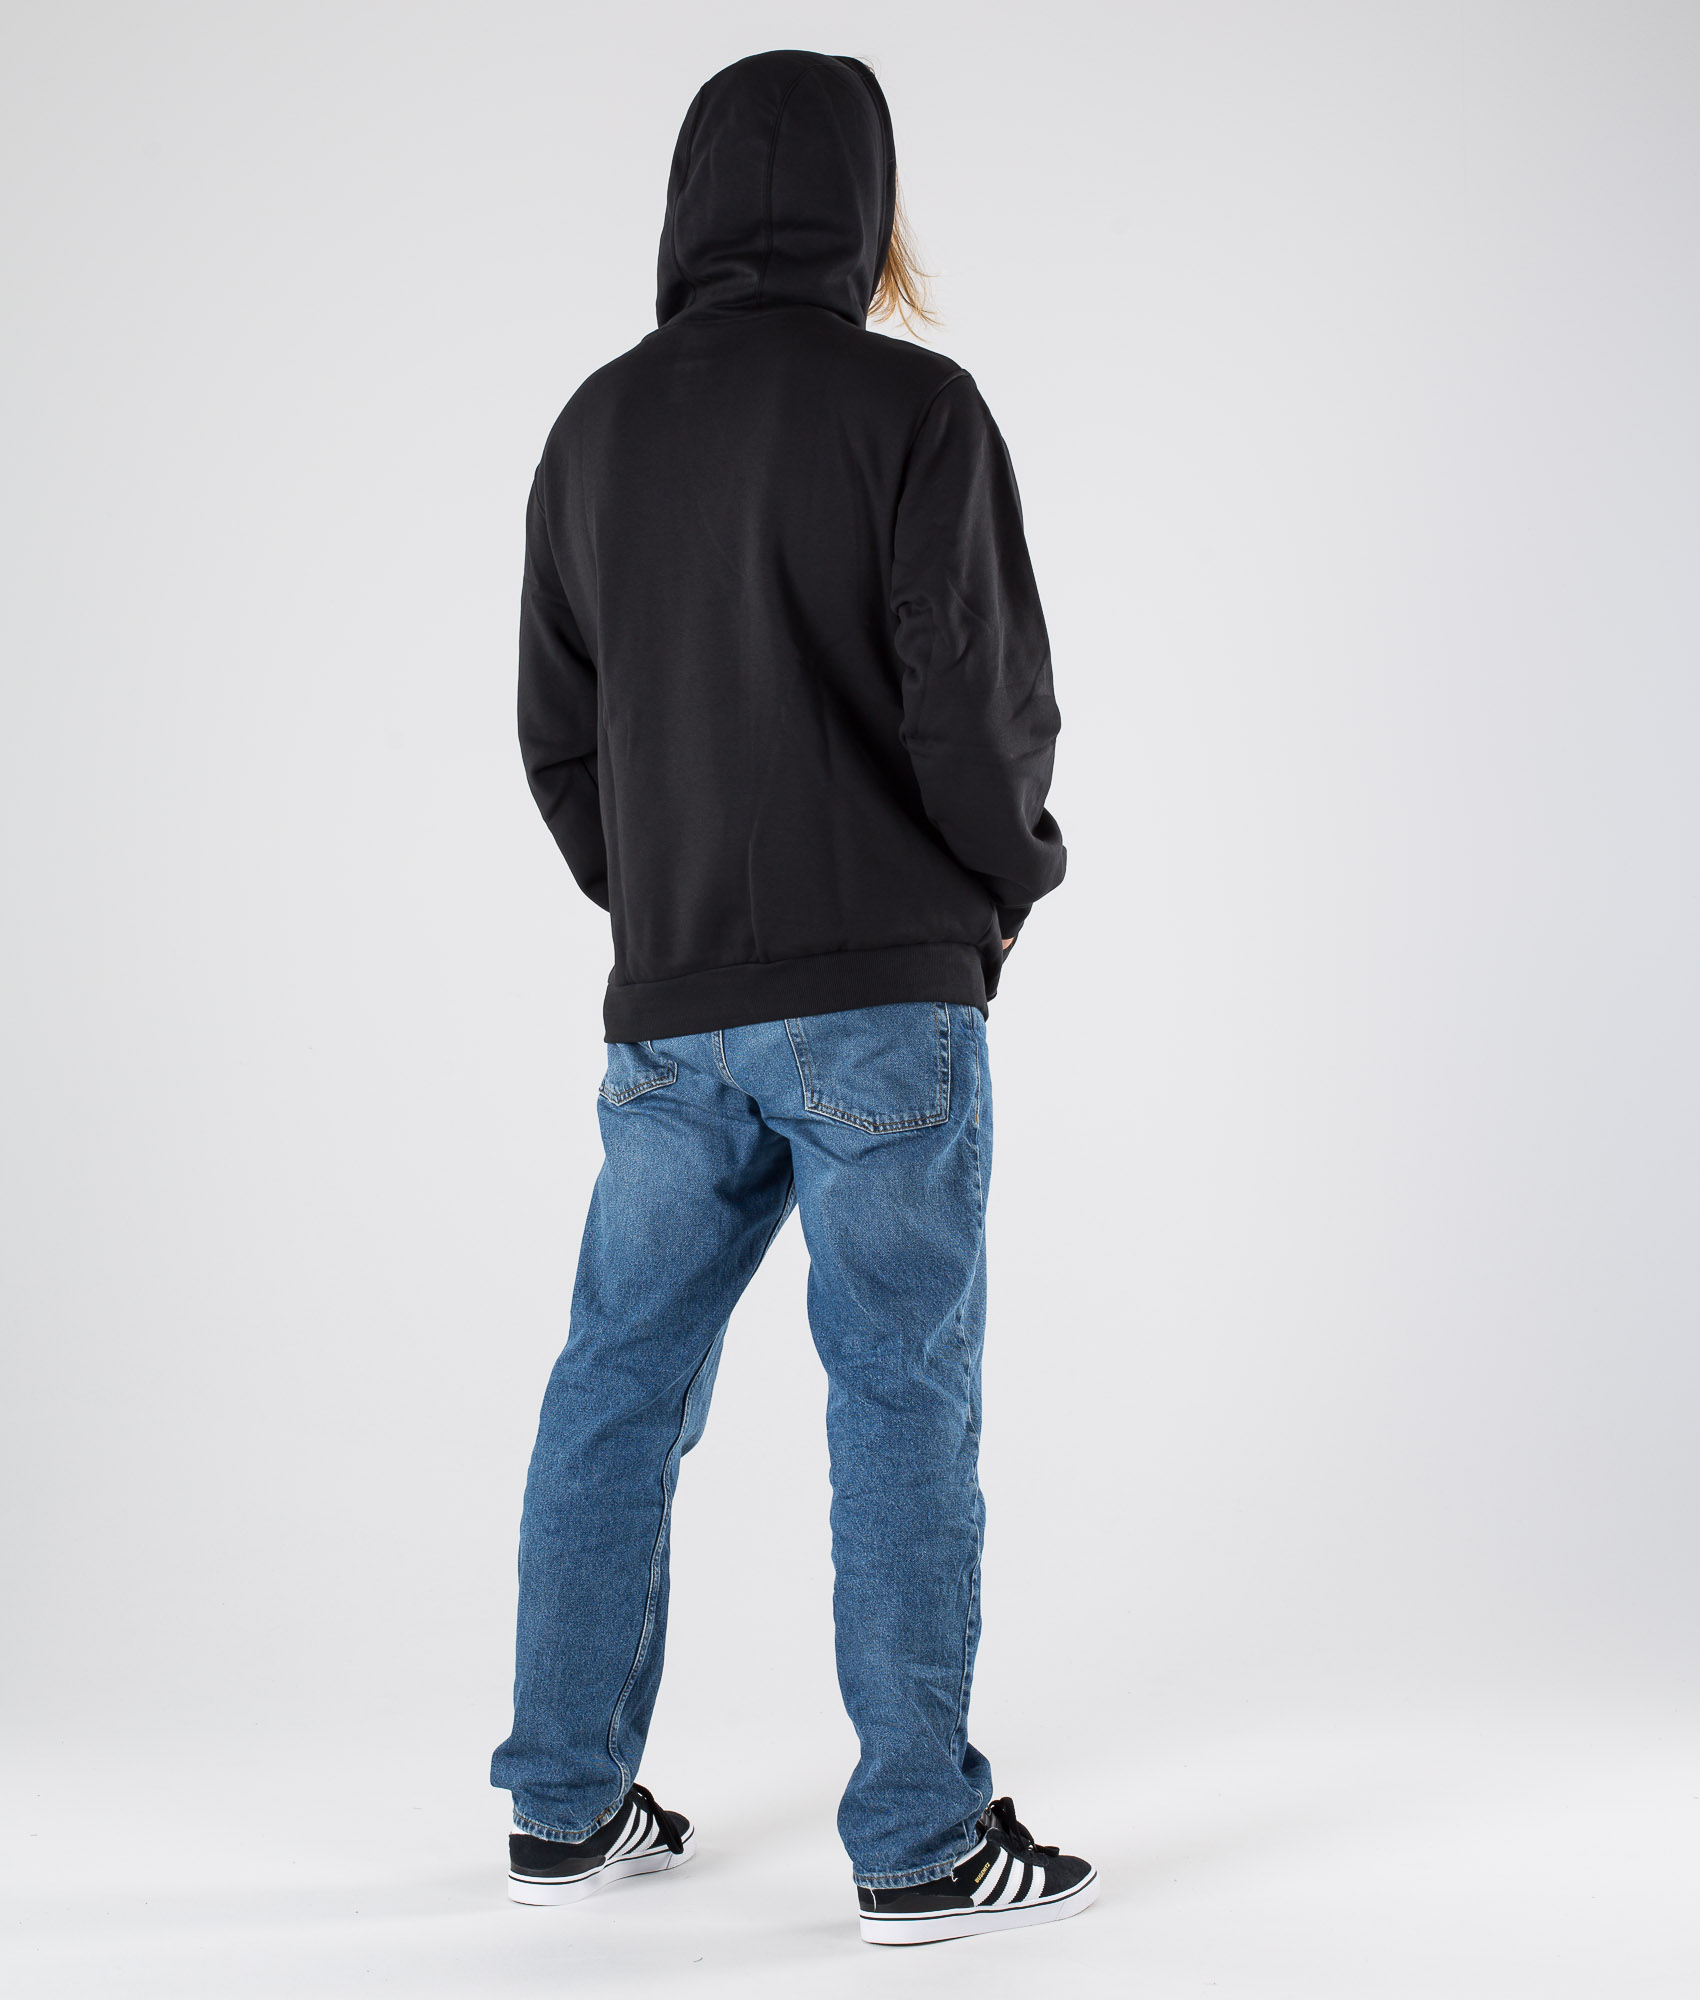 Adidas Skateboarding BB Print Hd Hoodie BlackActive TealActive Orange